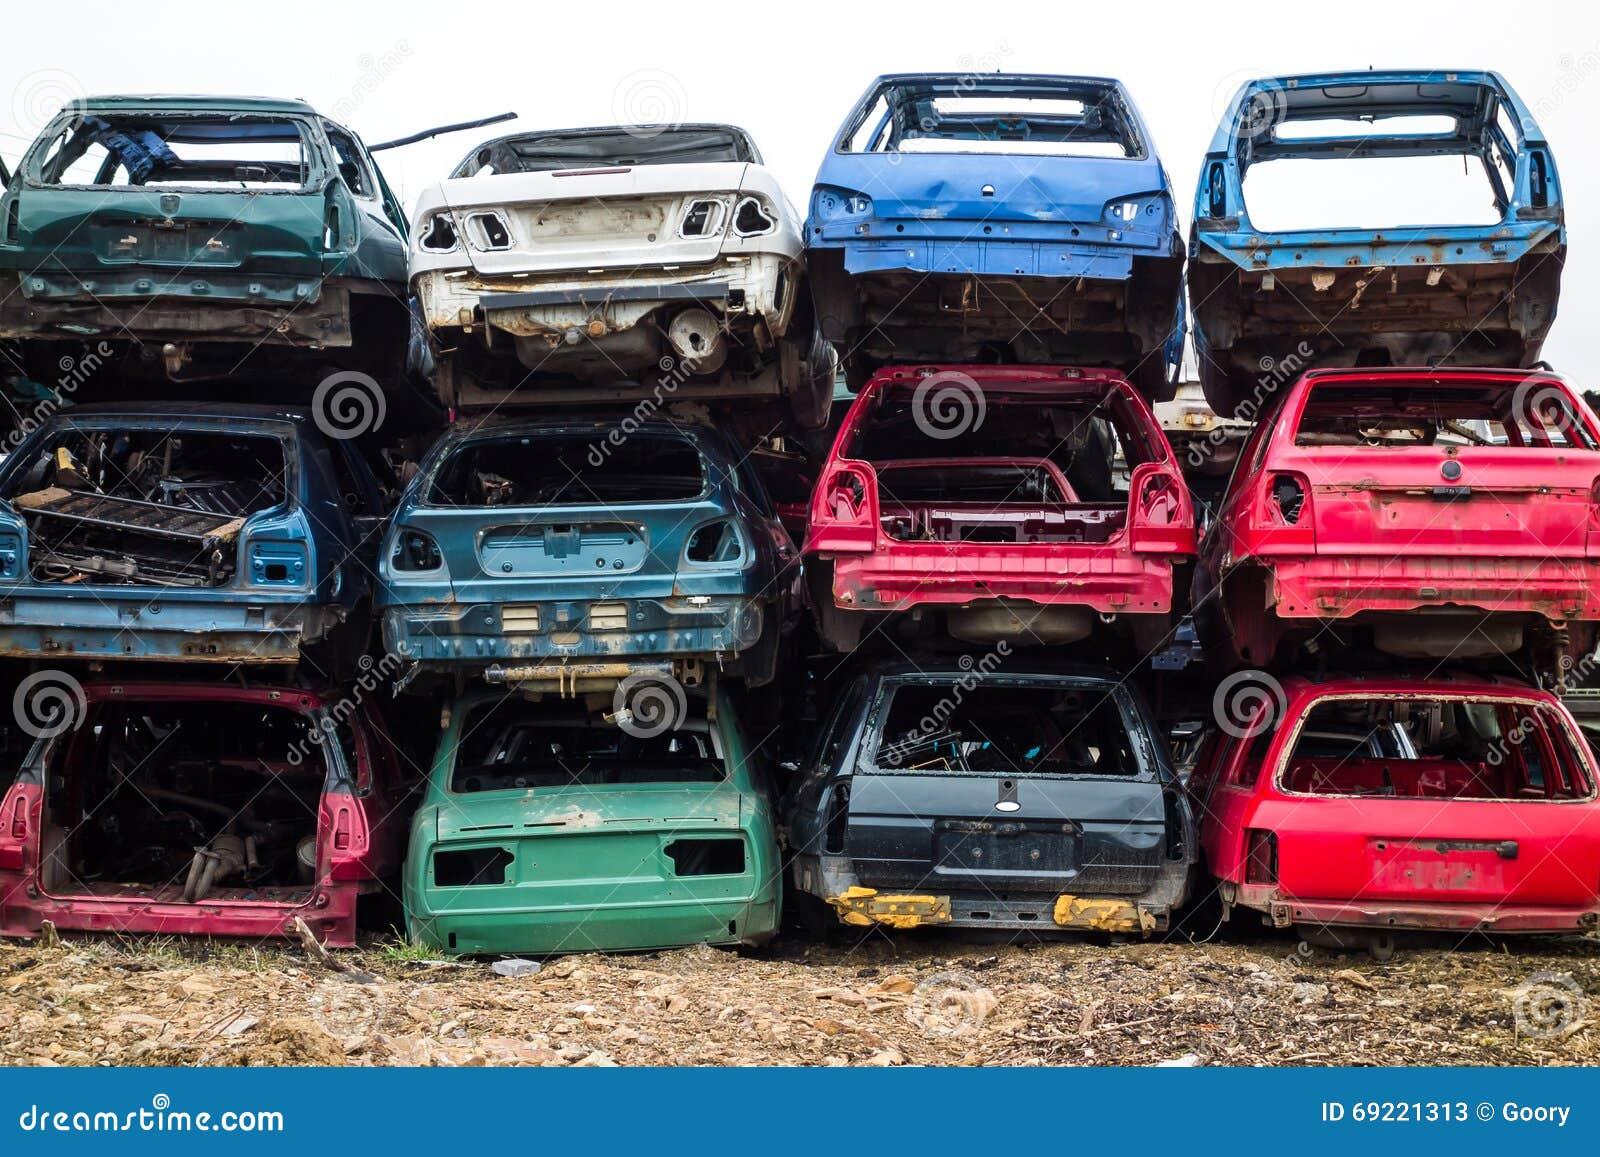 Cars at junkyard stock image. Image of junk, dump, piled - 69221313